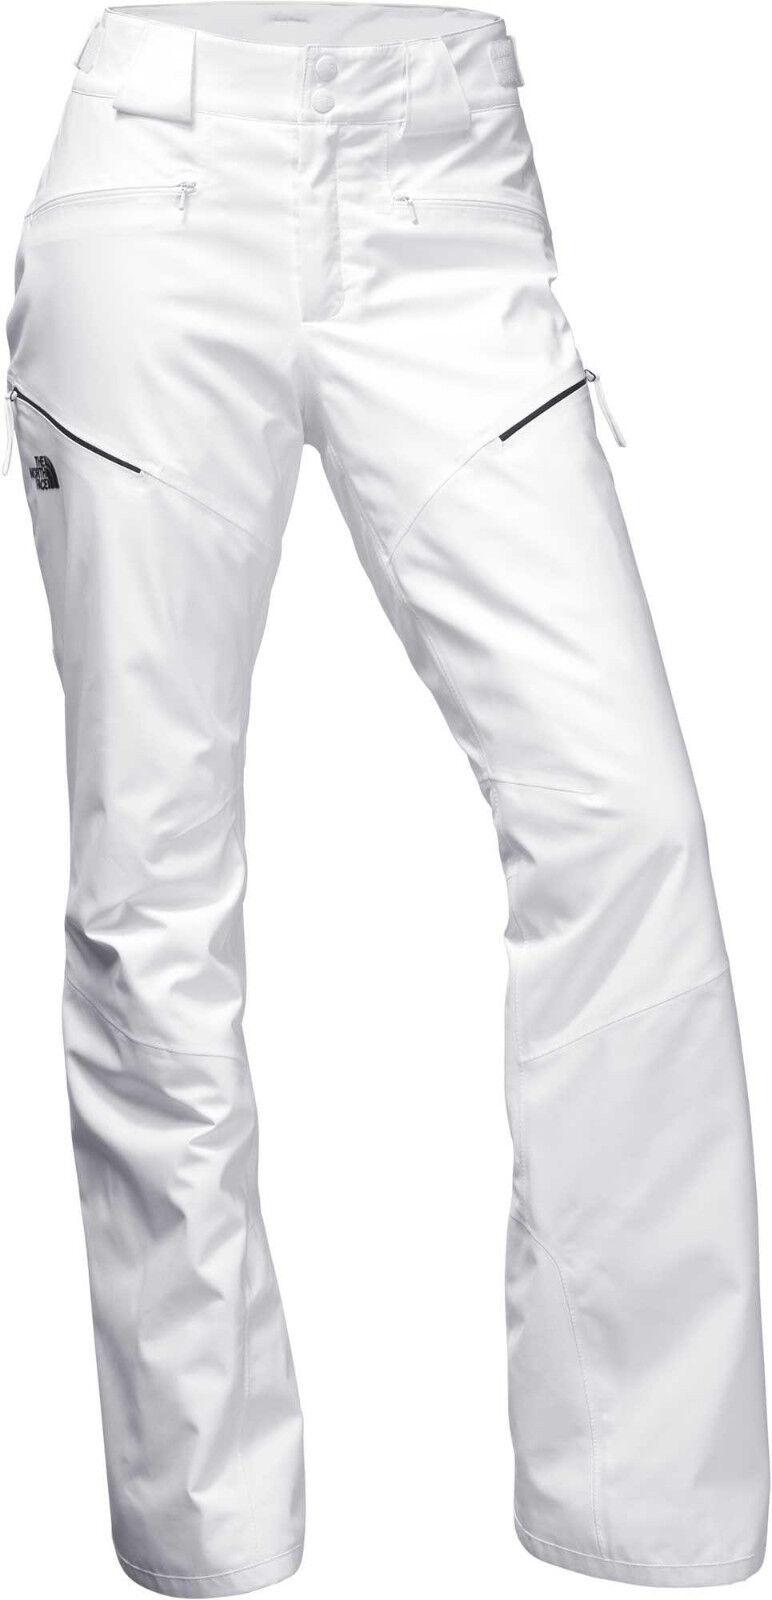 The North Face para Dama Anonym Gore-Tex Elástico Aislamiento Pantalones Esquí